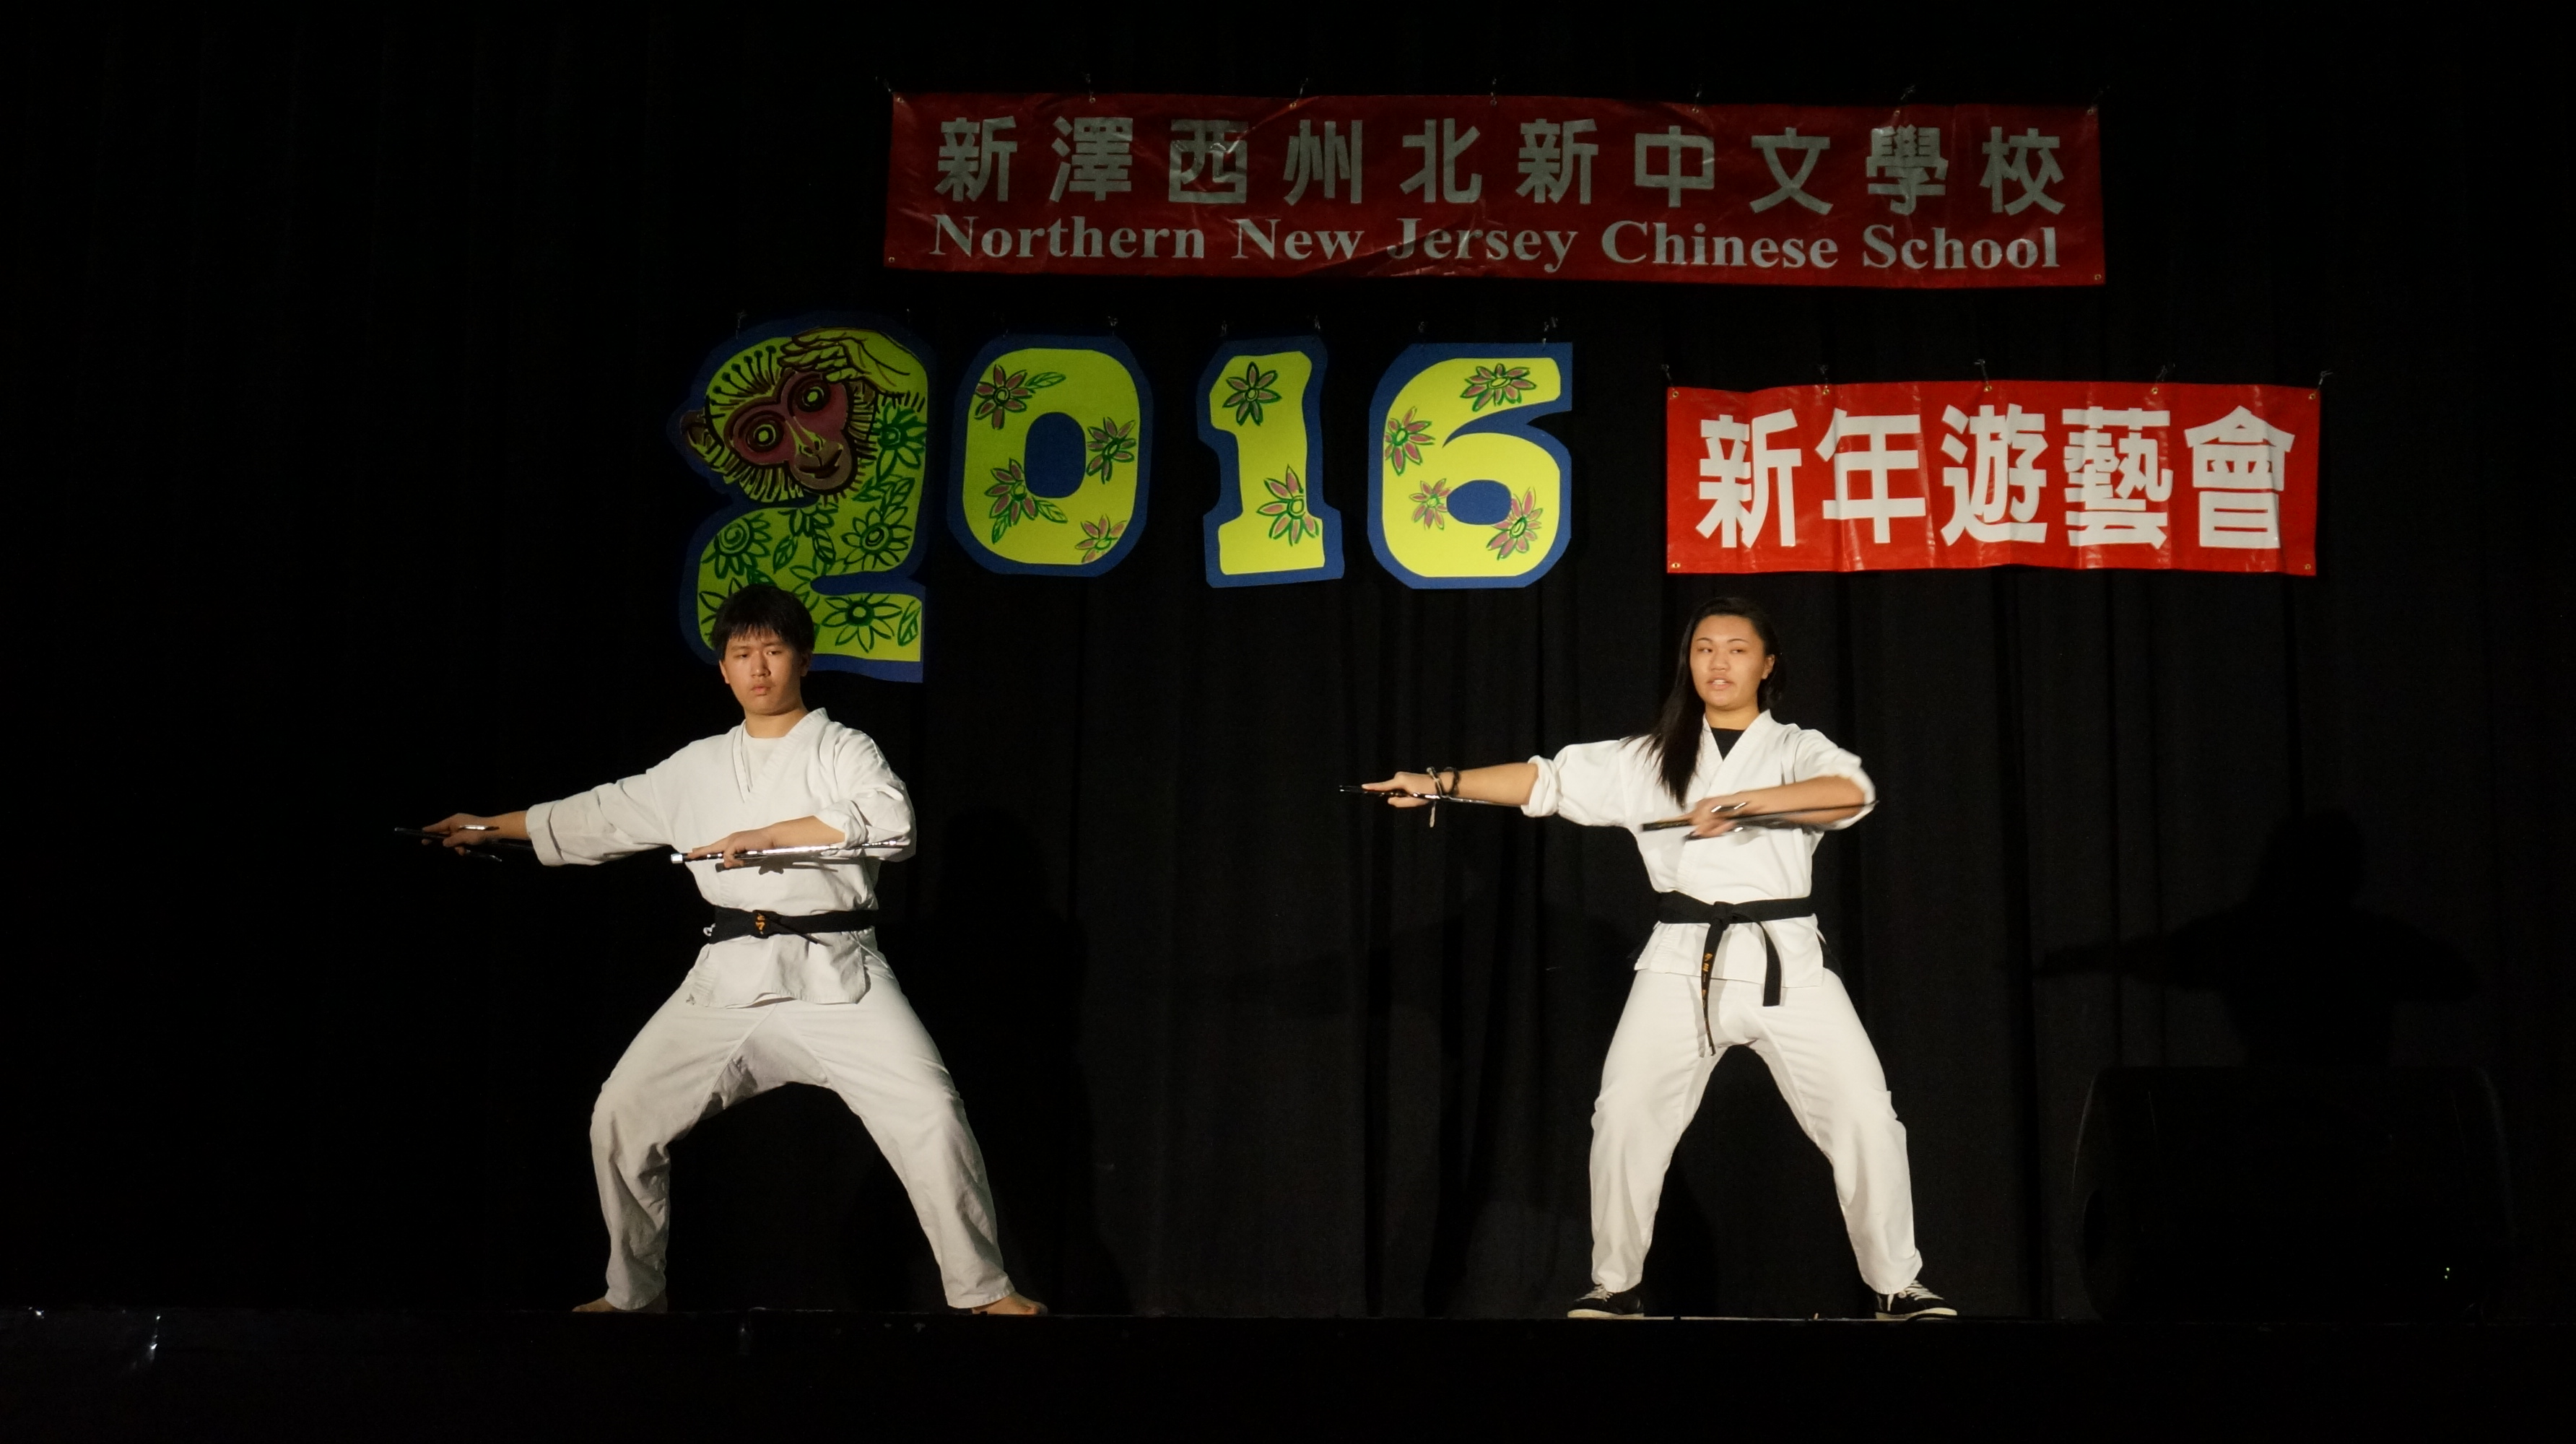 fe8ccf0055507bdf6a7c_aaa_Chinese_New_Year_pix_430.JPG